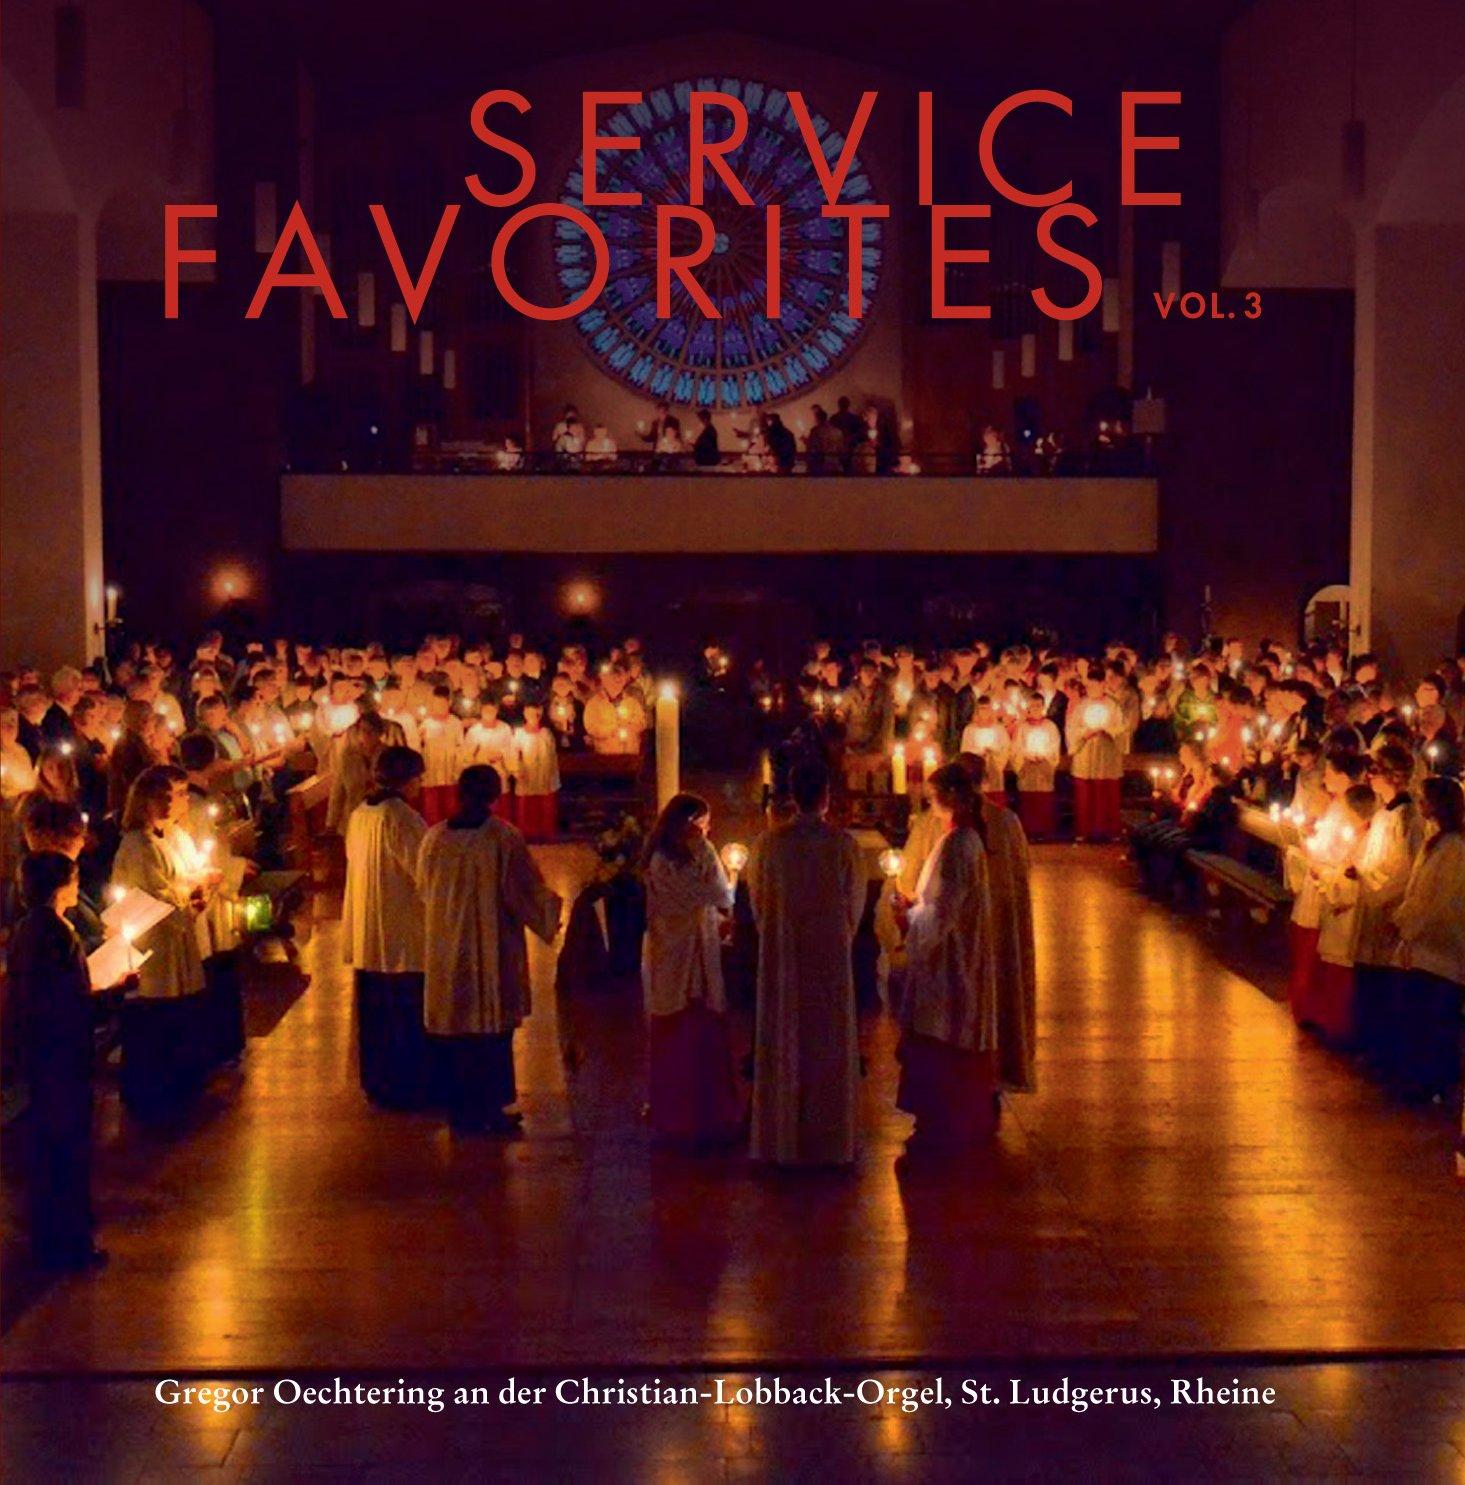 Service Favorites Vol.3 Cover.jpg